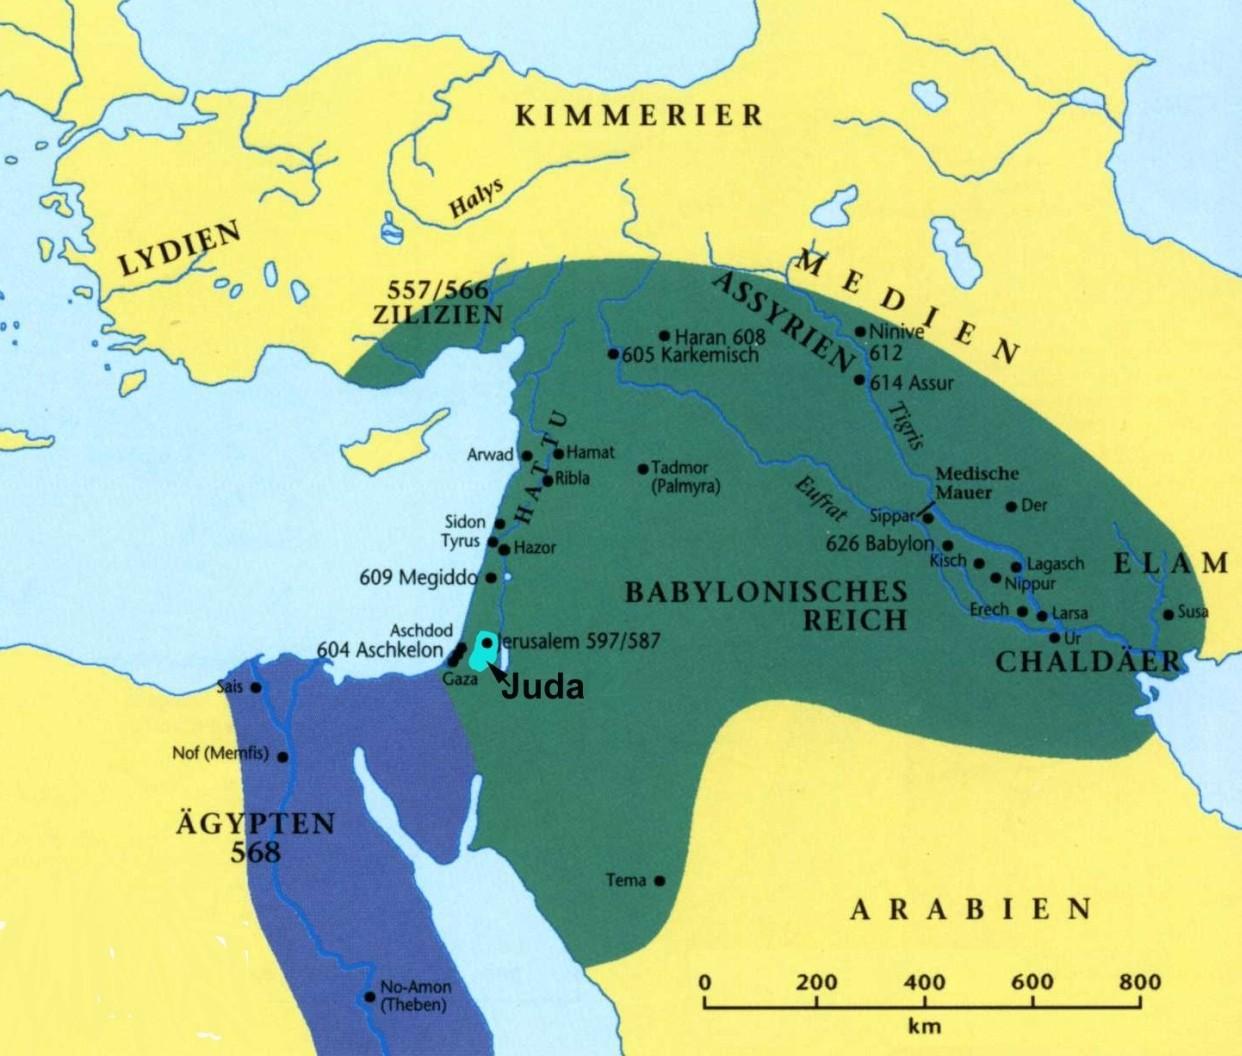 Jerusalem Karte Heute.Lexikon Bibelwissenschaft De